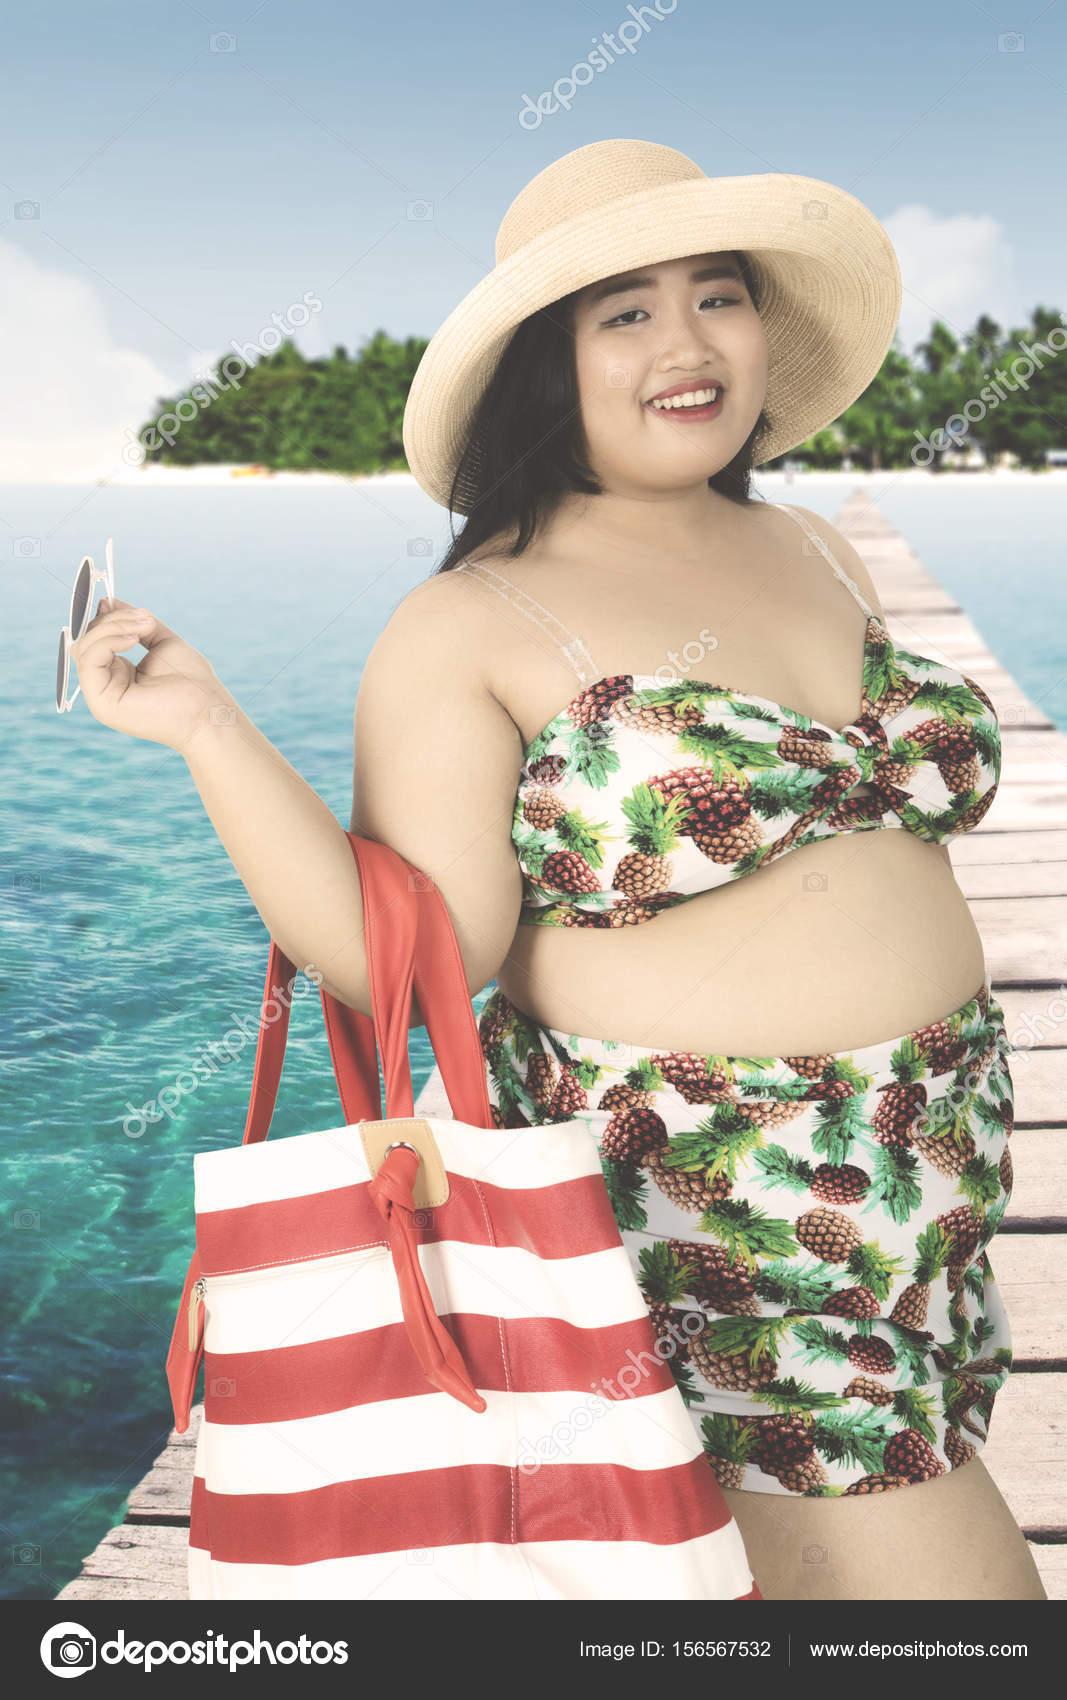 En Embarcadero Obesa Mujer Con Bikini n0yvNw8Om